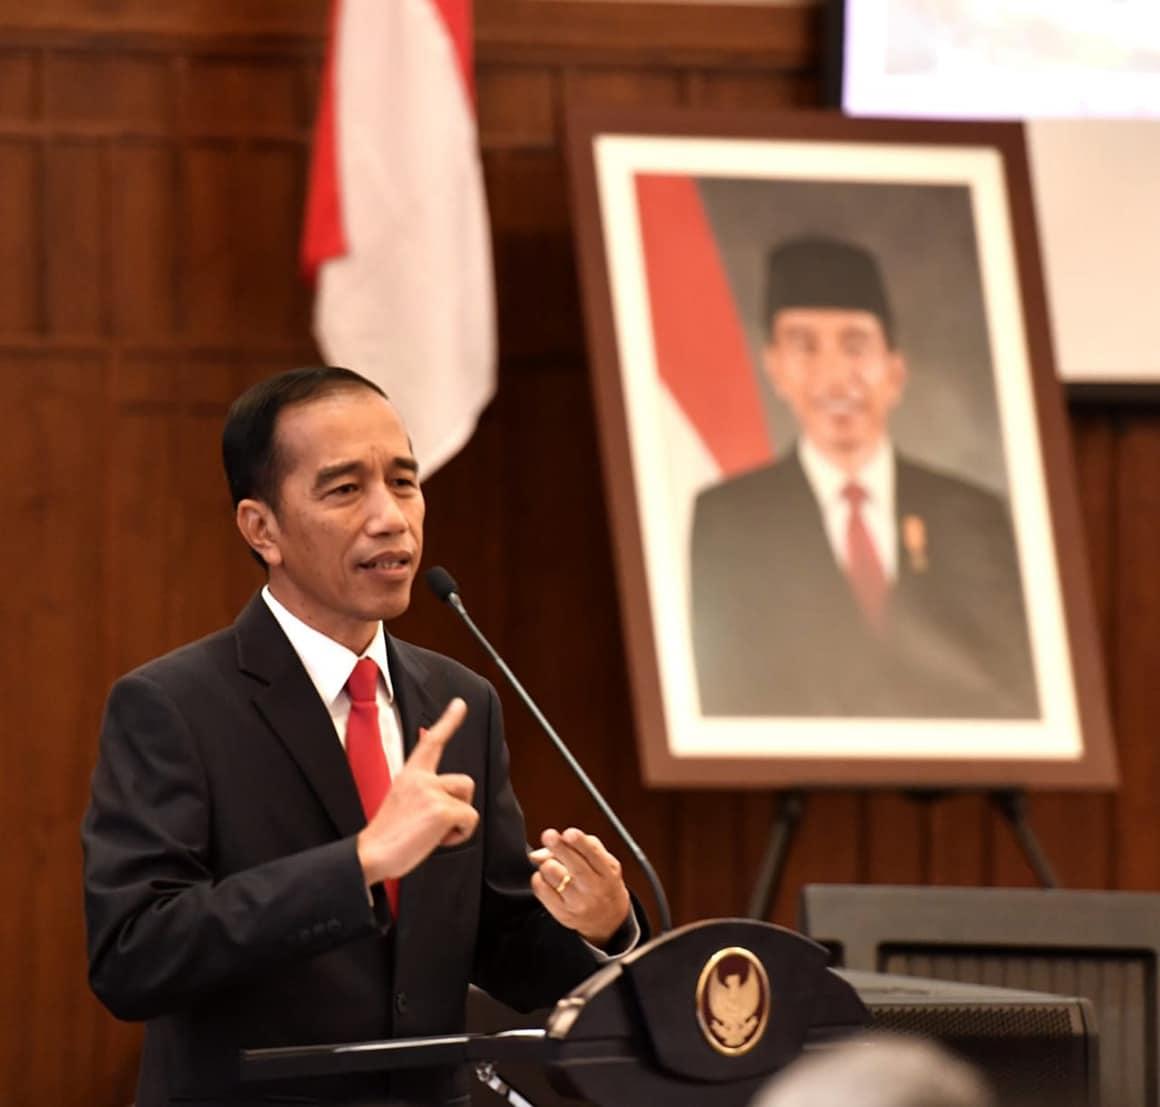 Pak Jokowi, Bapak Telah Berhasil Mematahkan Keraguan Saya!